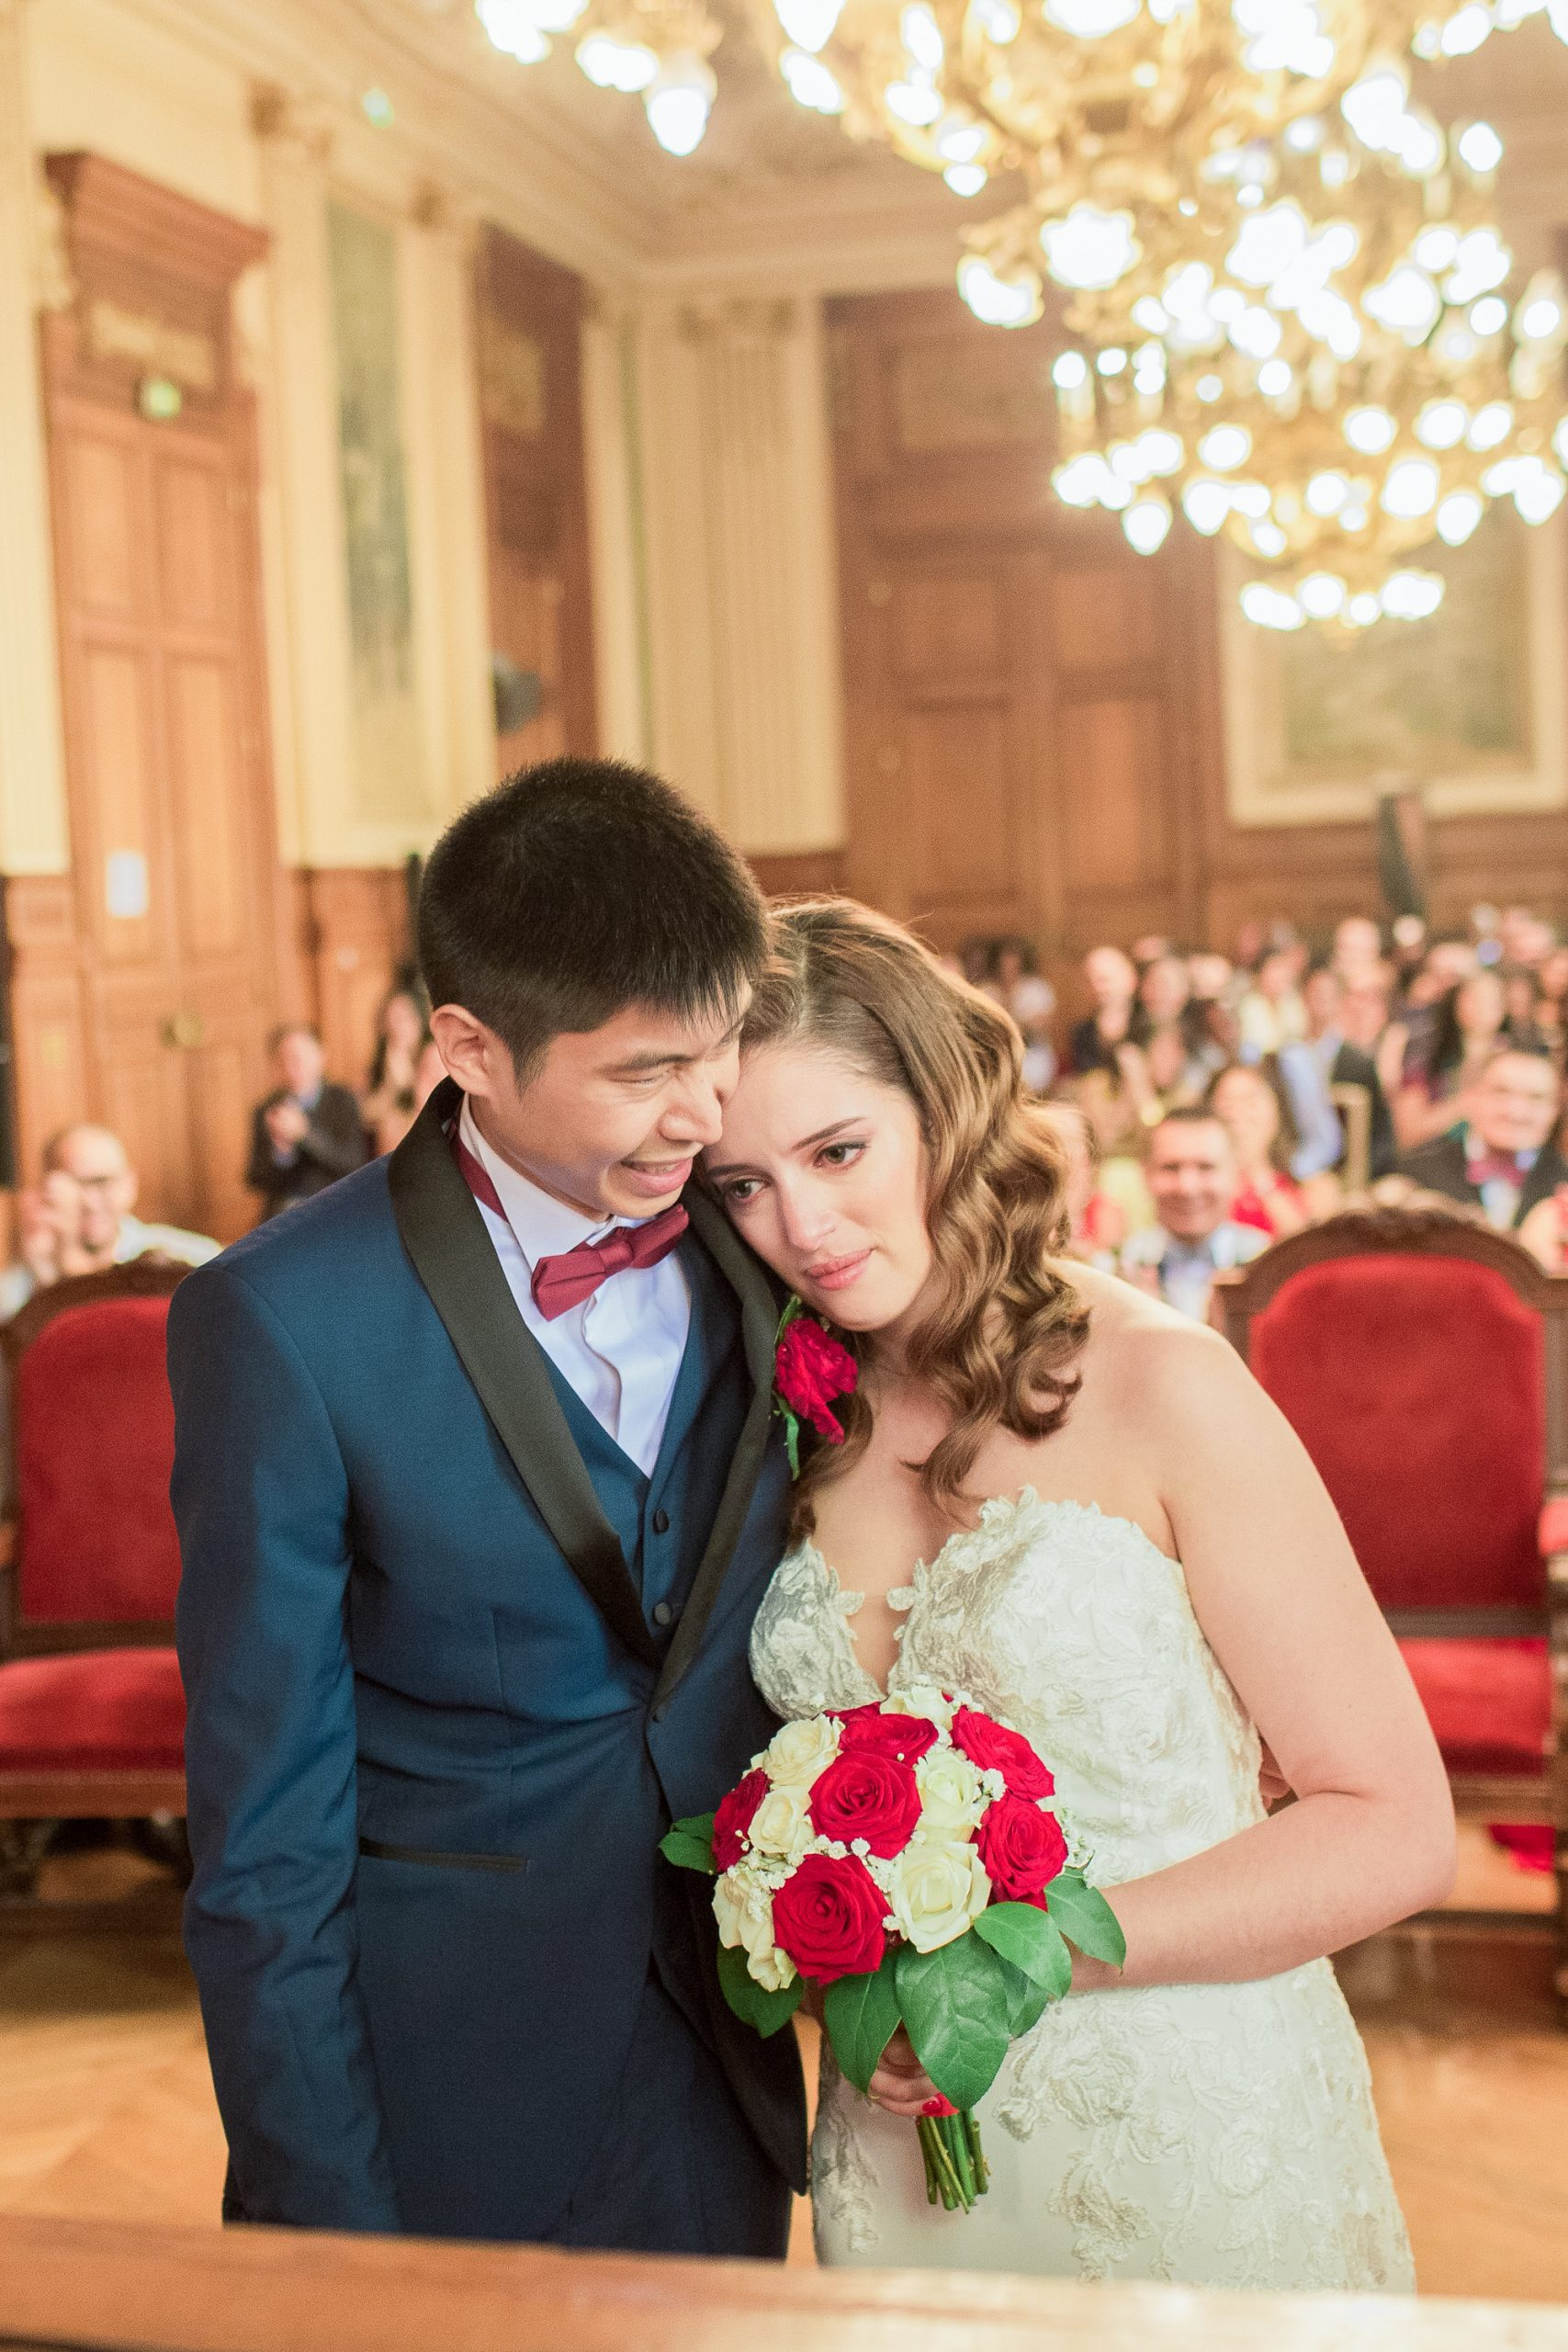 photographie-mariage-emotion-naturel-paris-mairie-18eme